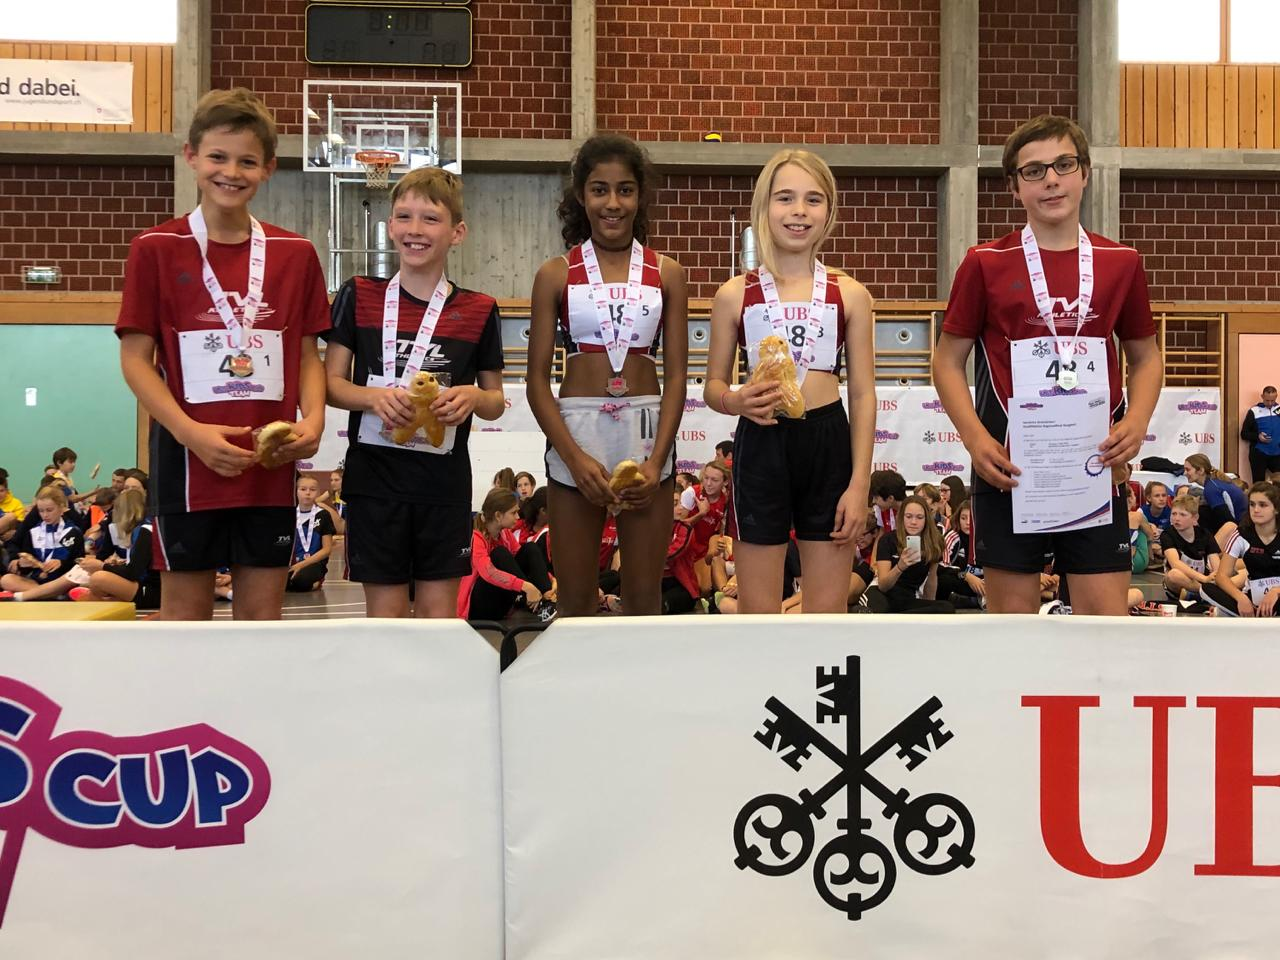 Bericht – UBS Kids Cup Team 19/20 Herzogenbuchsee